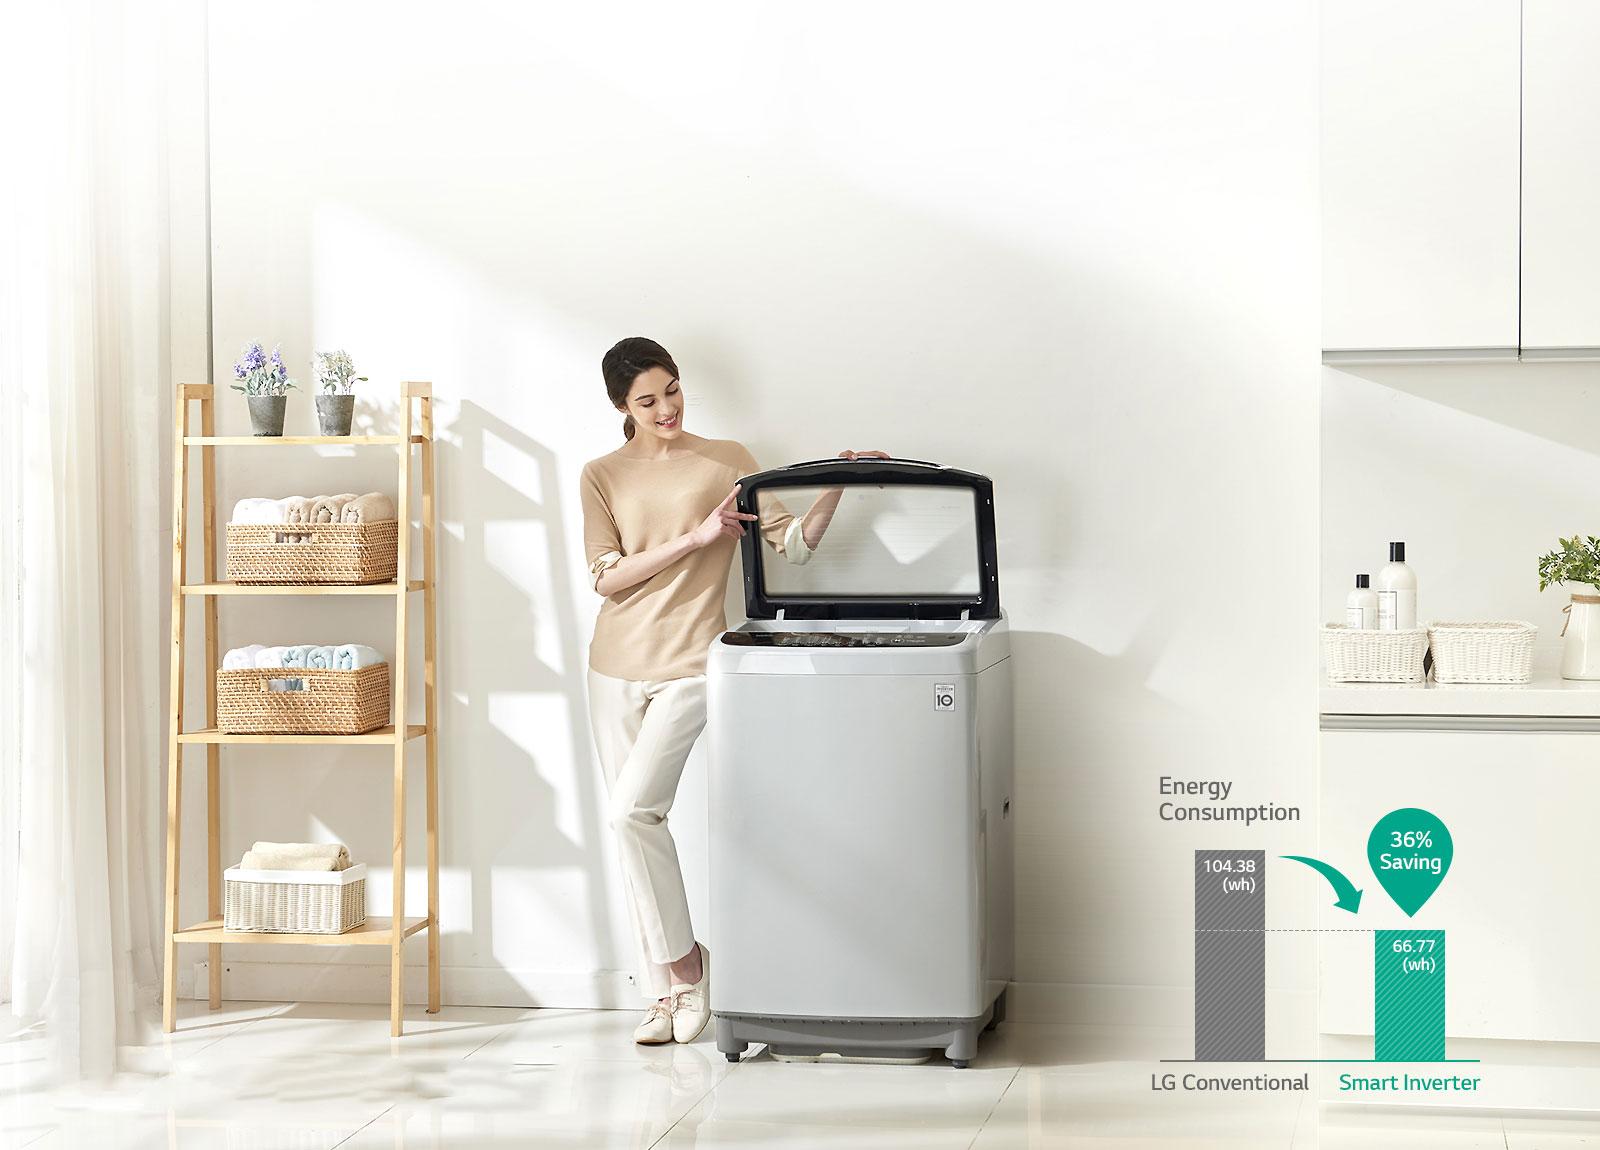 Energy Saving with Smart Inverter Control3